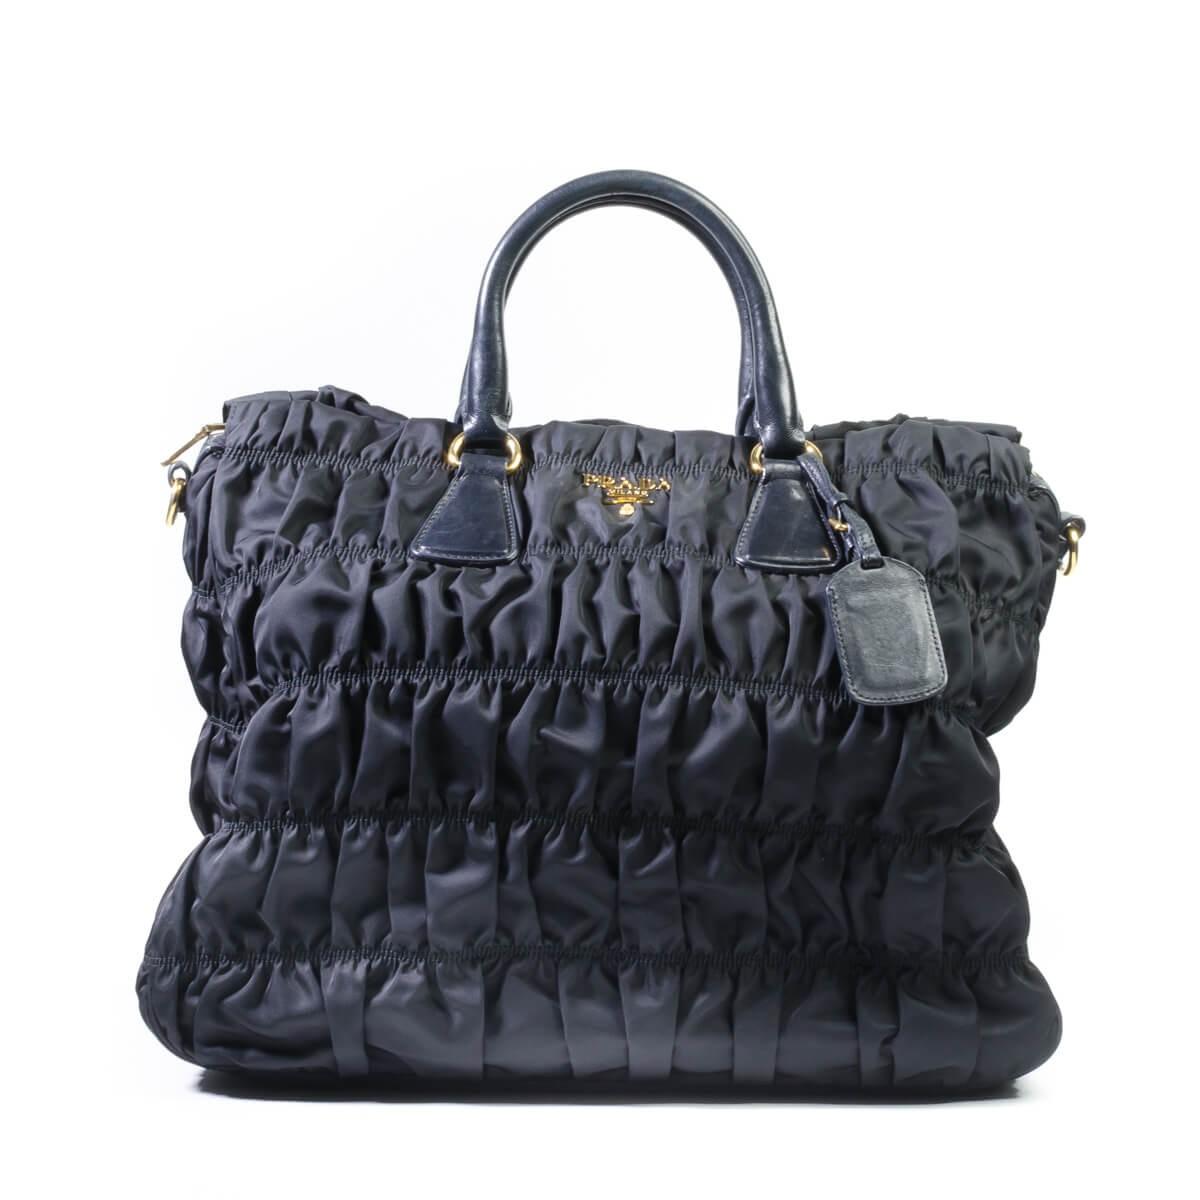 6e5735e5330b Tessuto Nylon Gaufre Tote Bag